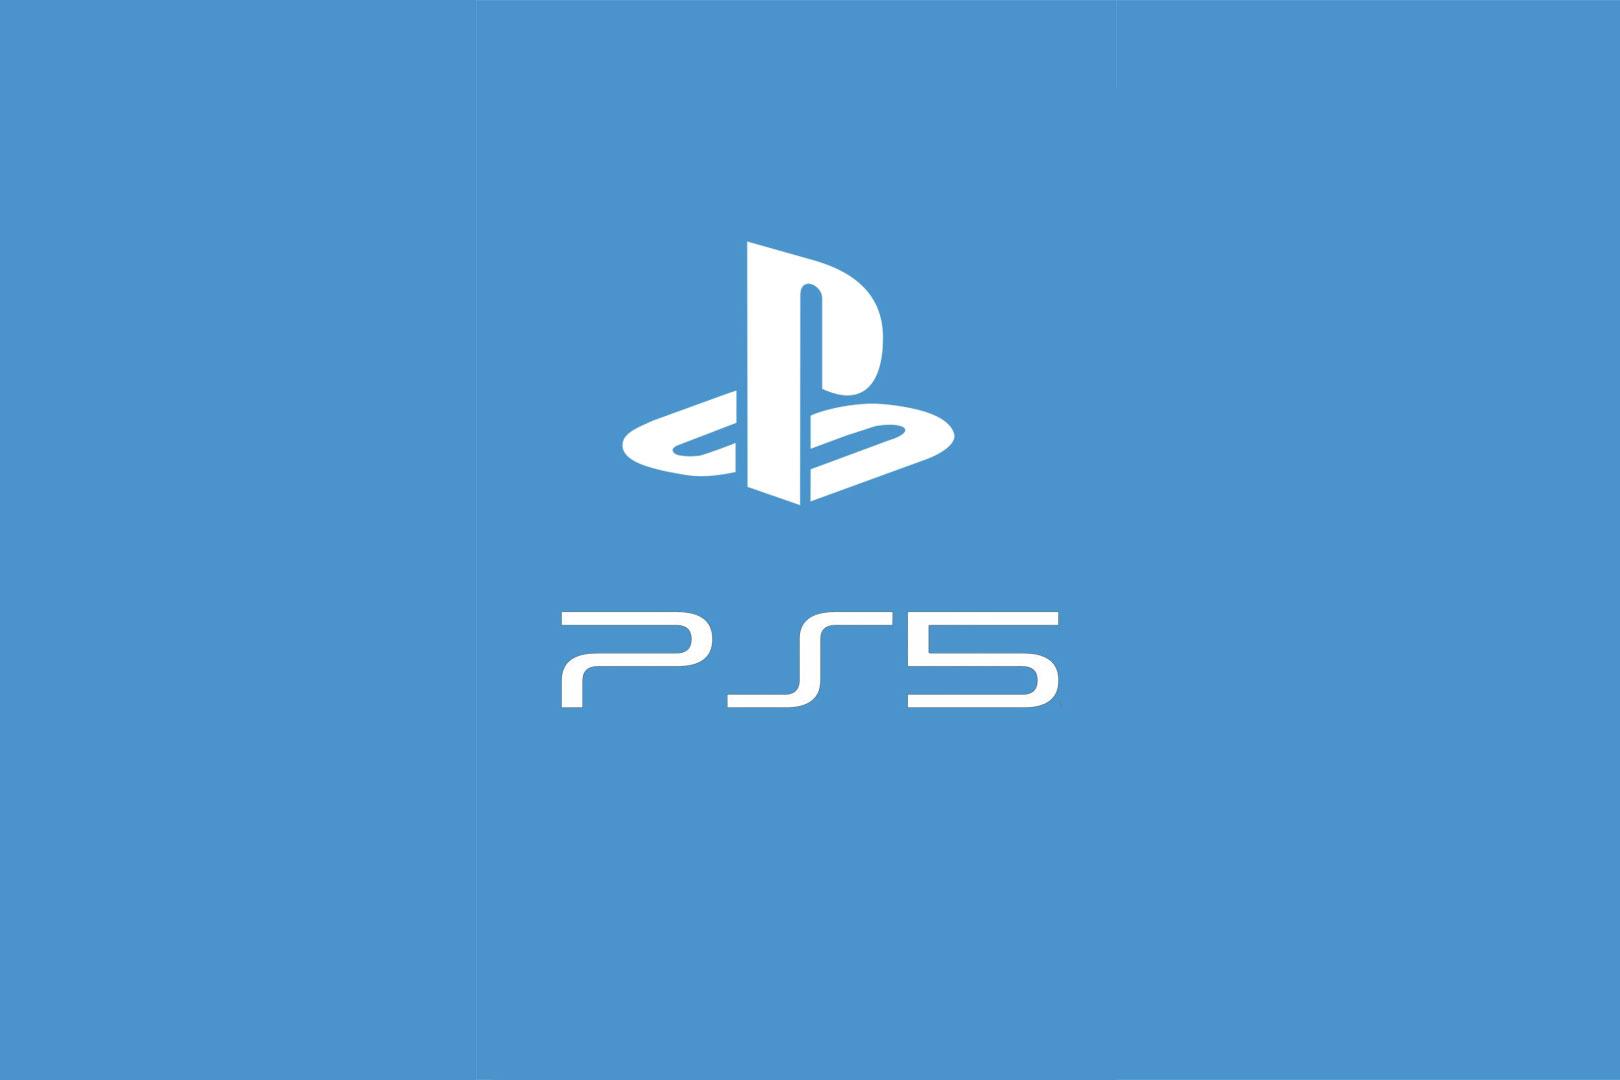 PS5上跑PS4游戏:分辨率、帧率将双双提升